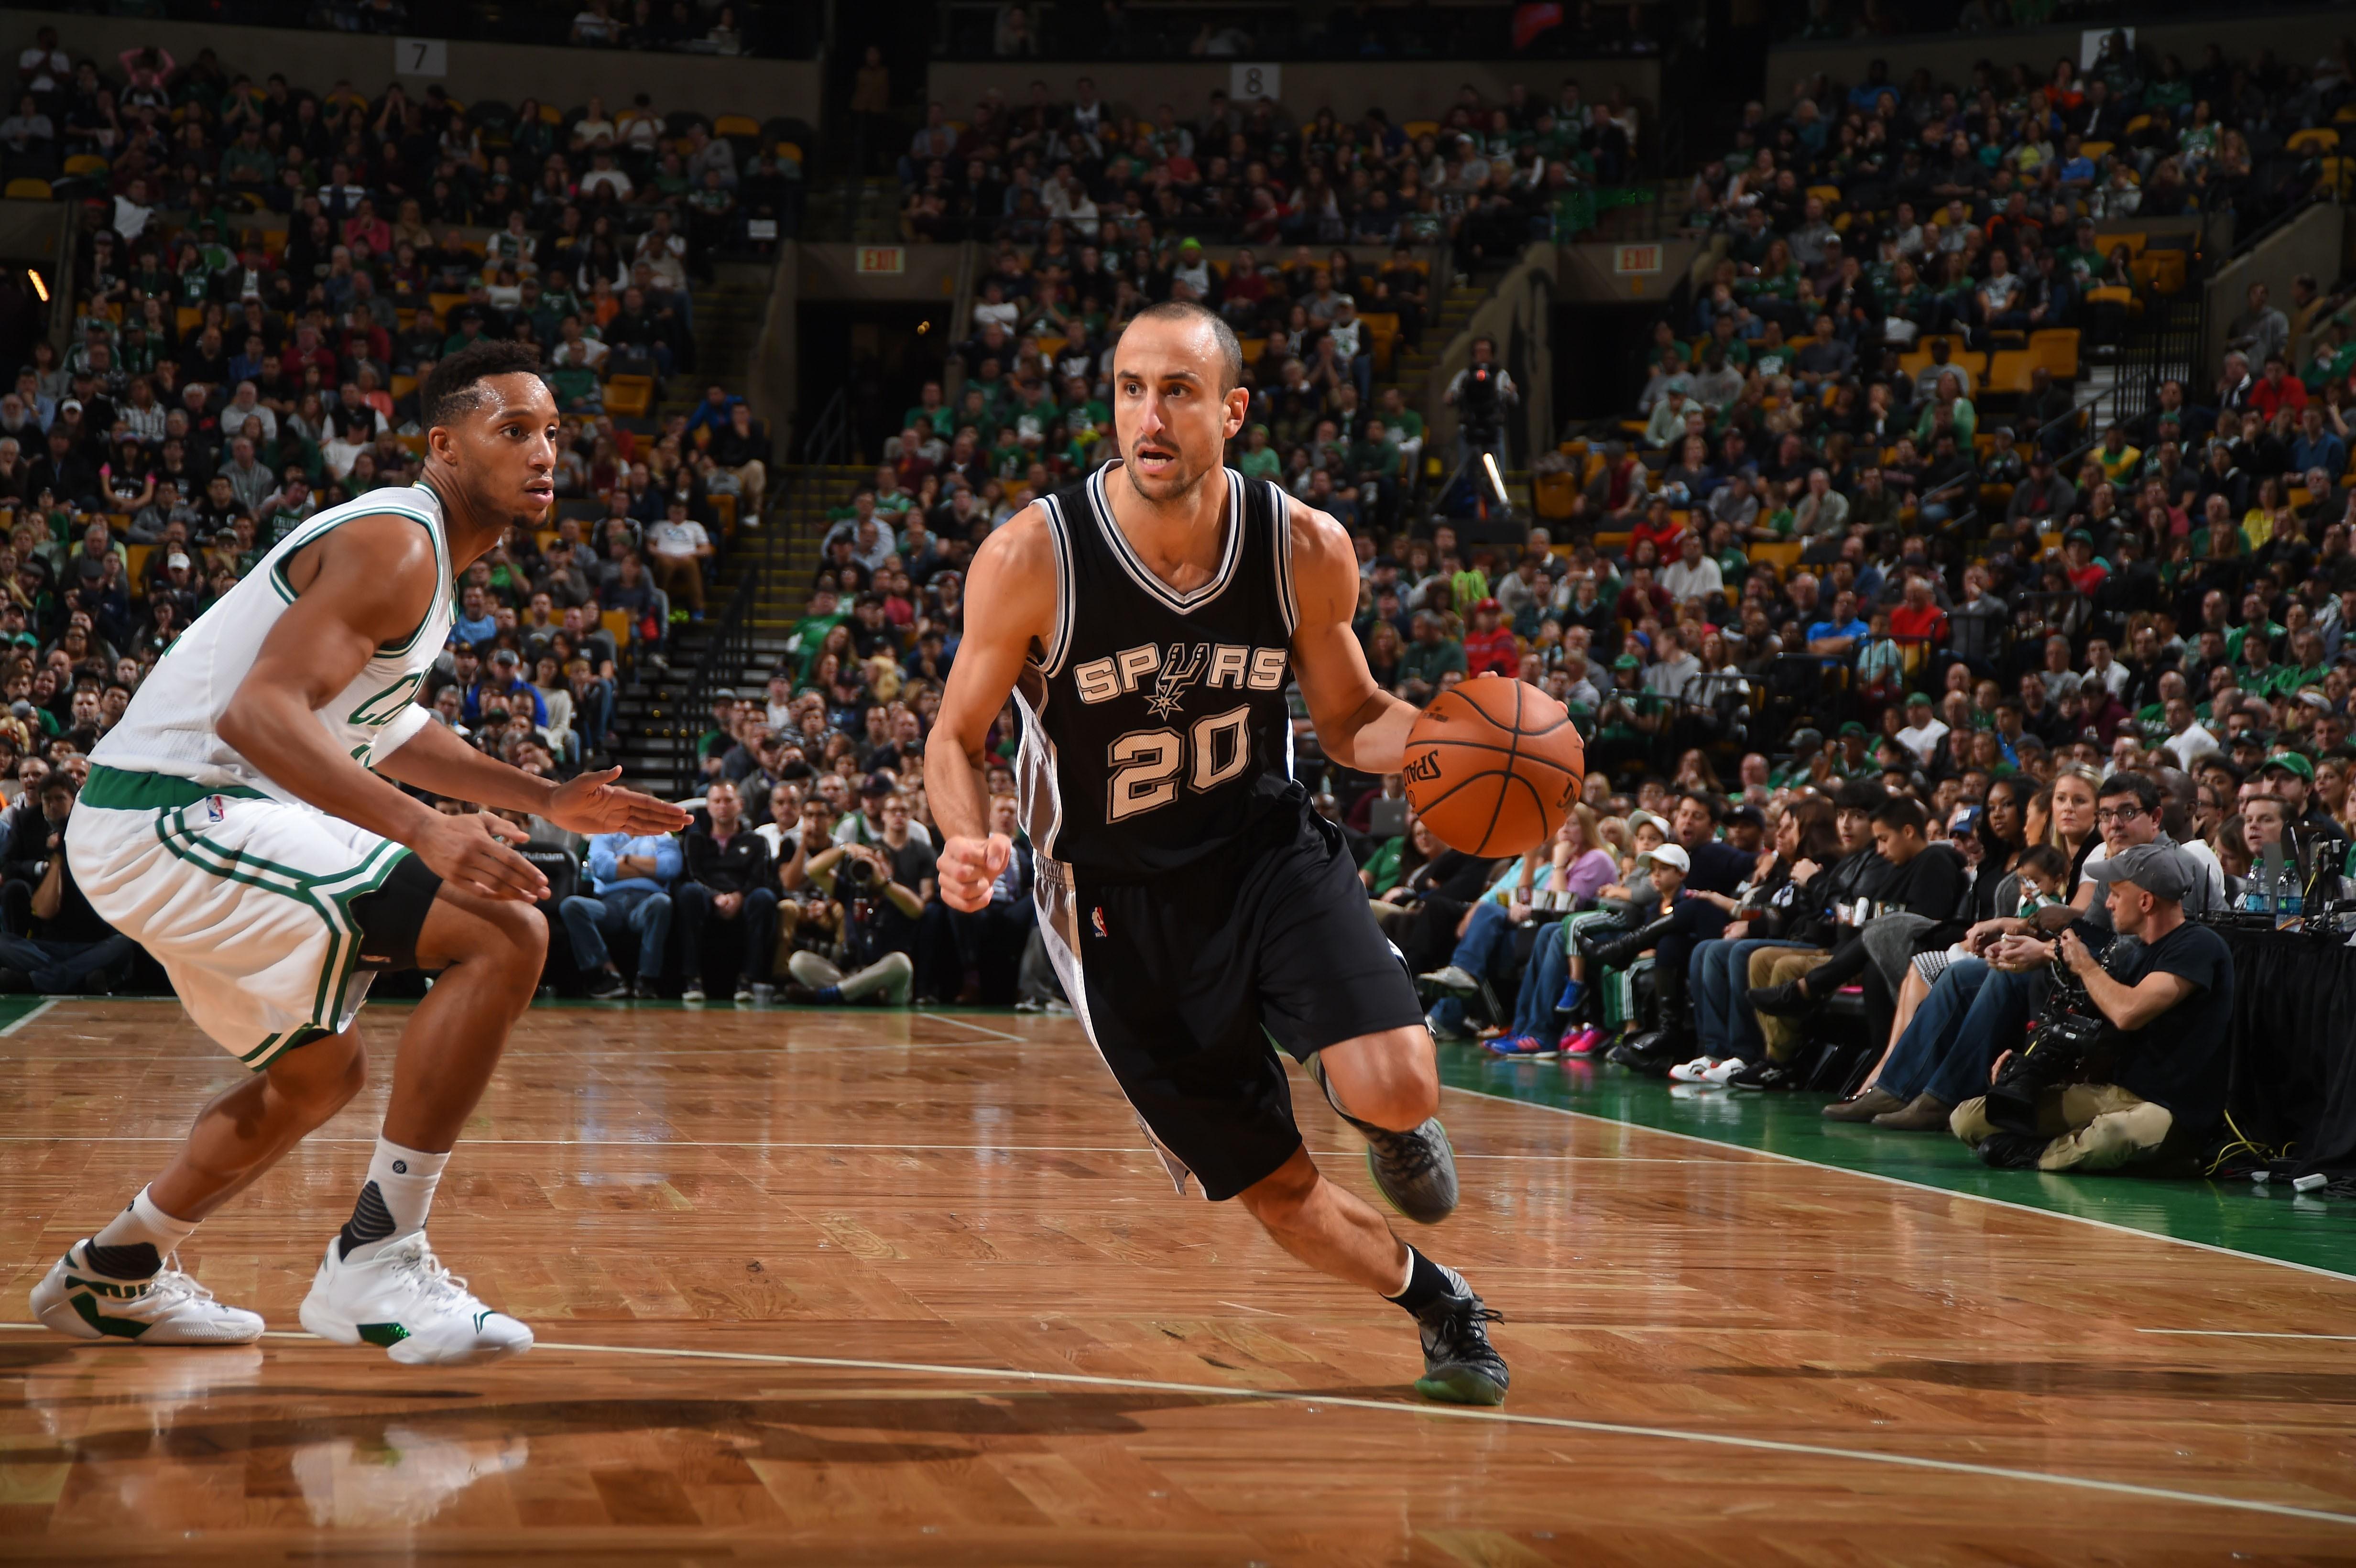 Spurs' Manu Ginobili Announces Retirement From NBA After 16 Seasons